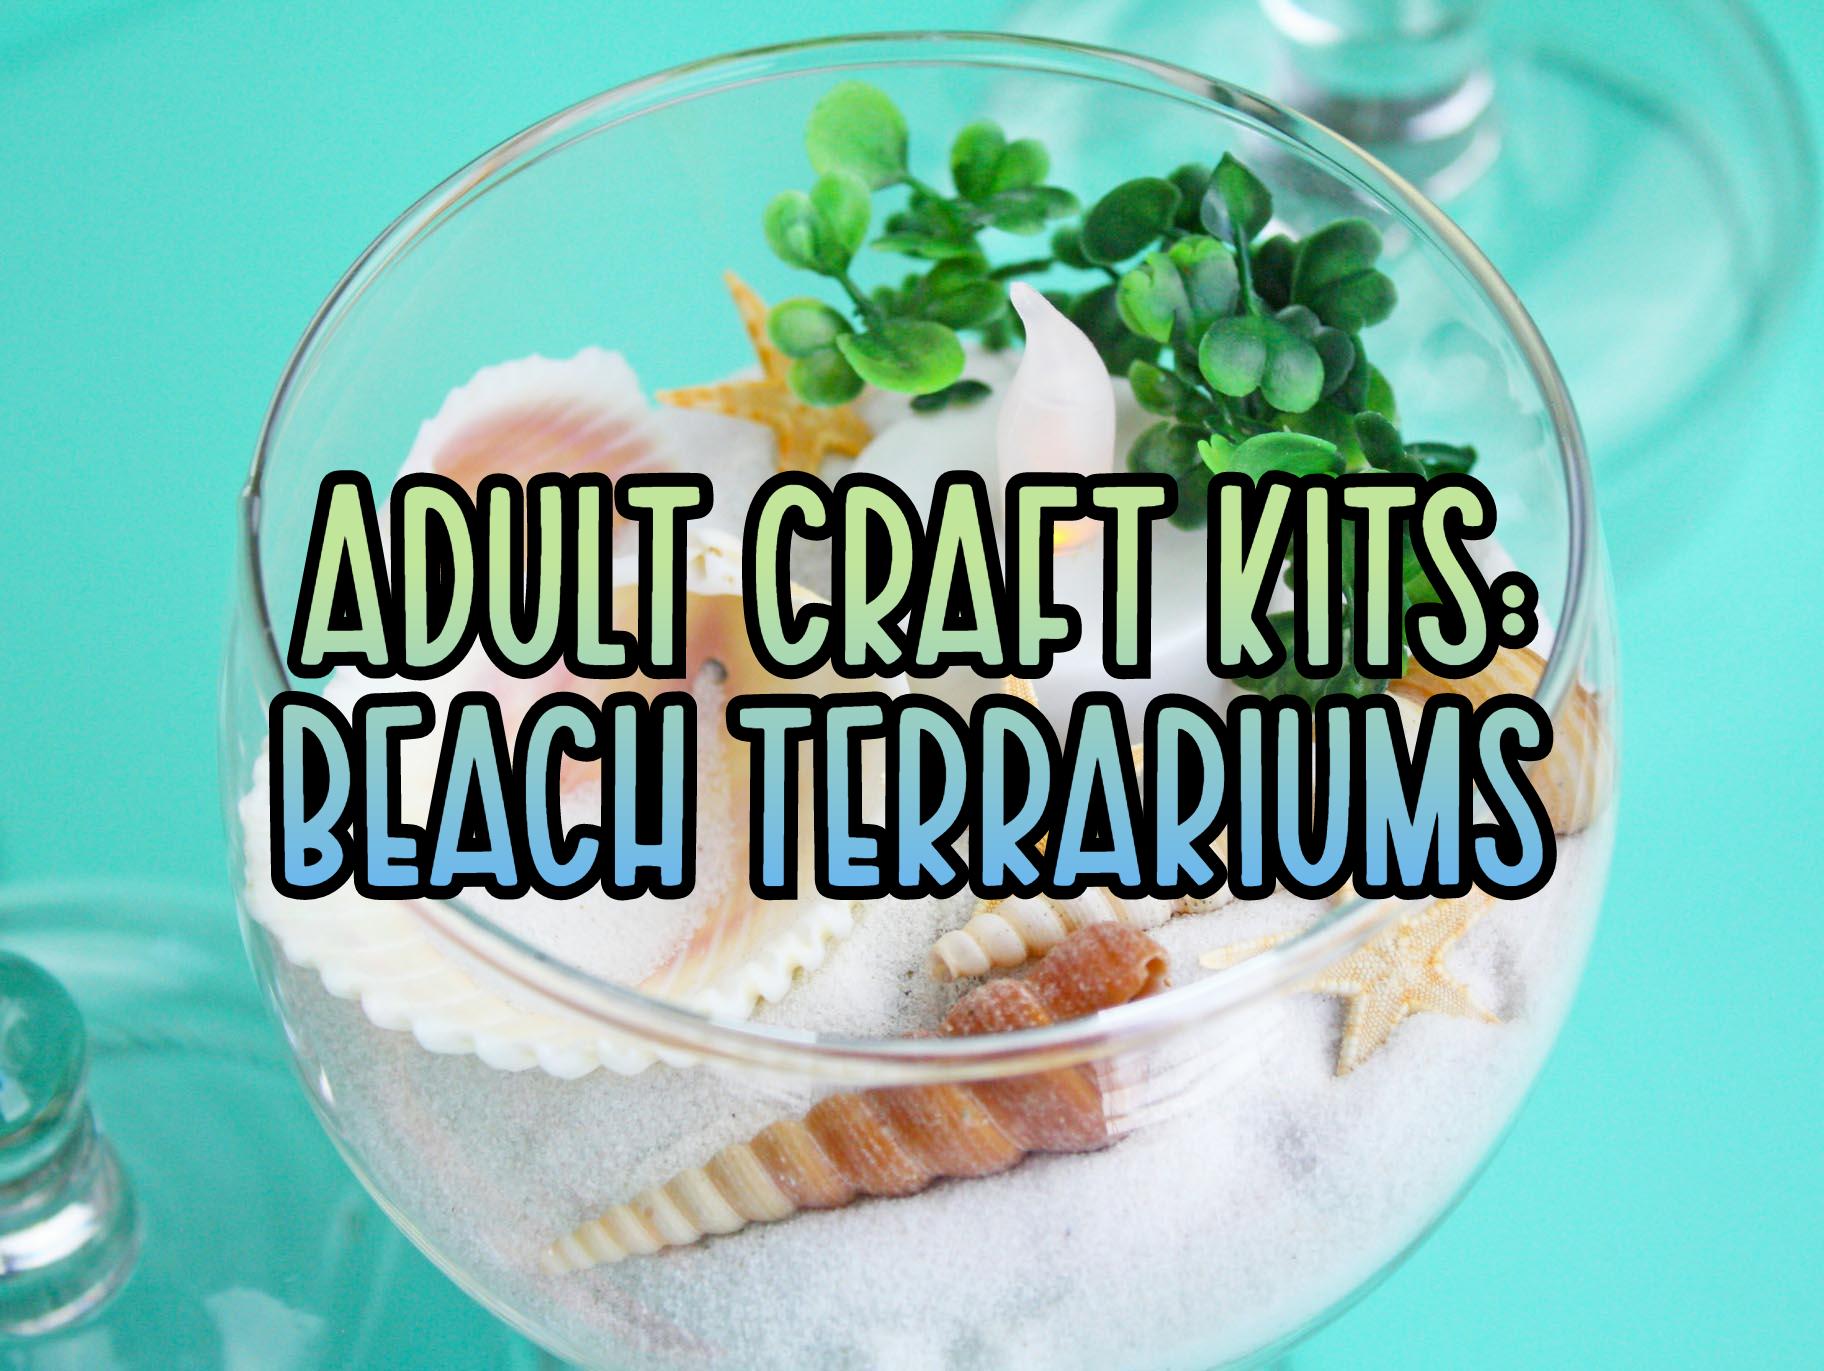 Adult Craft Kits: Beach Terrariums